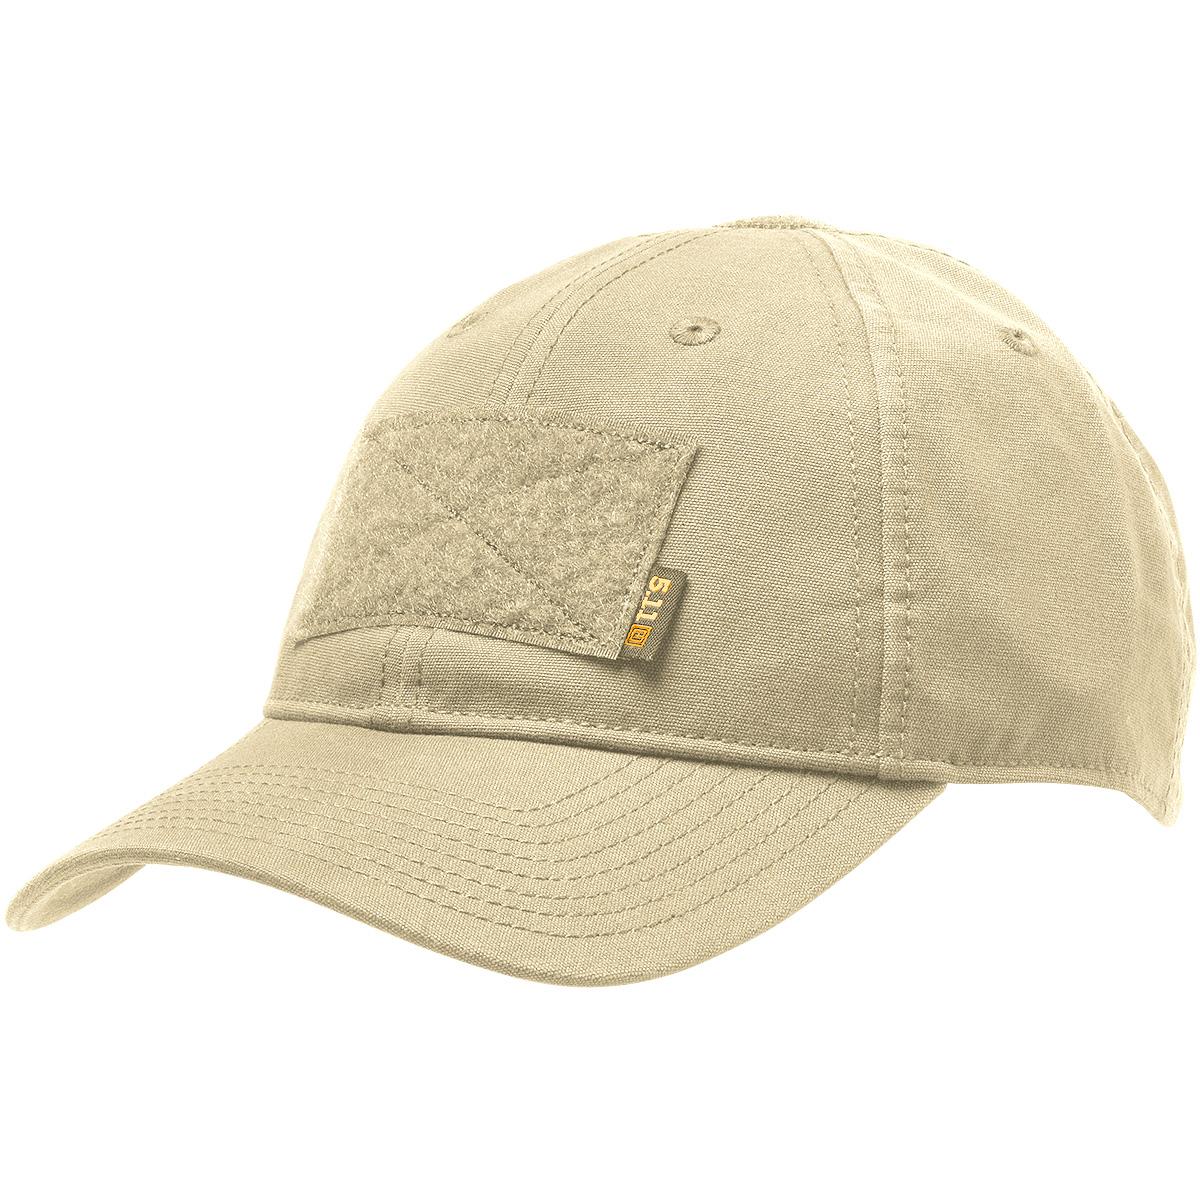 225a288720069 5.11 Tactical Flag Bearer Cap - Caps - Headwear